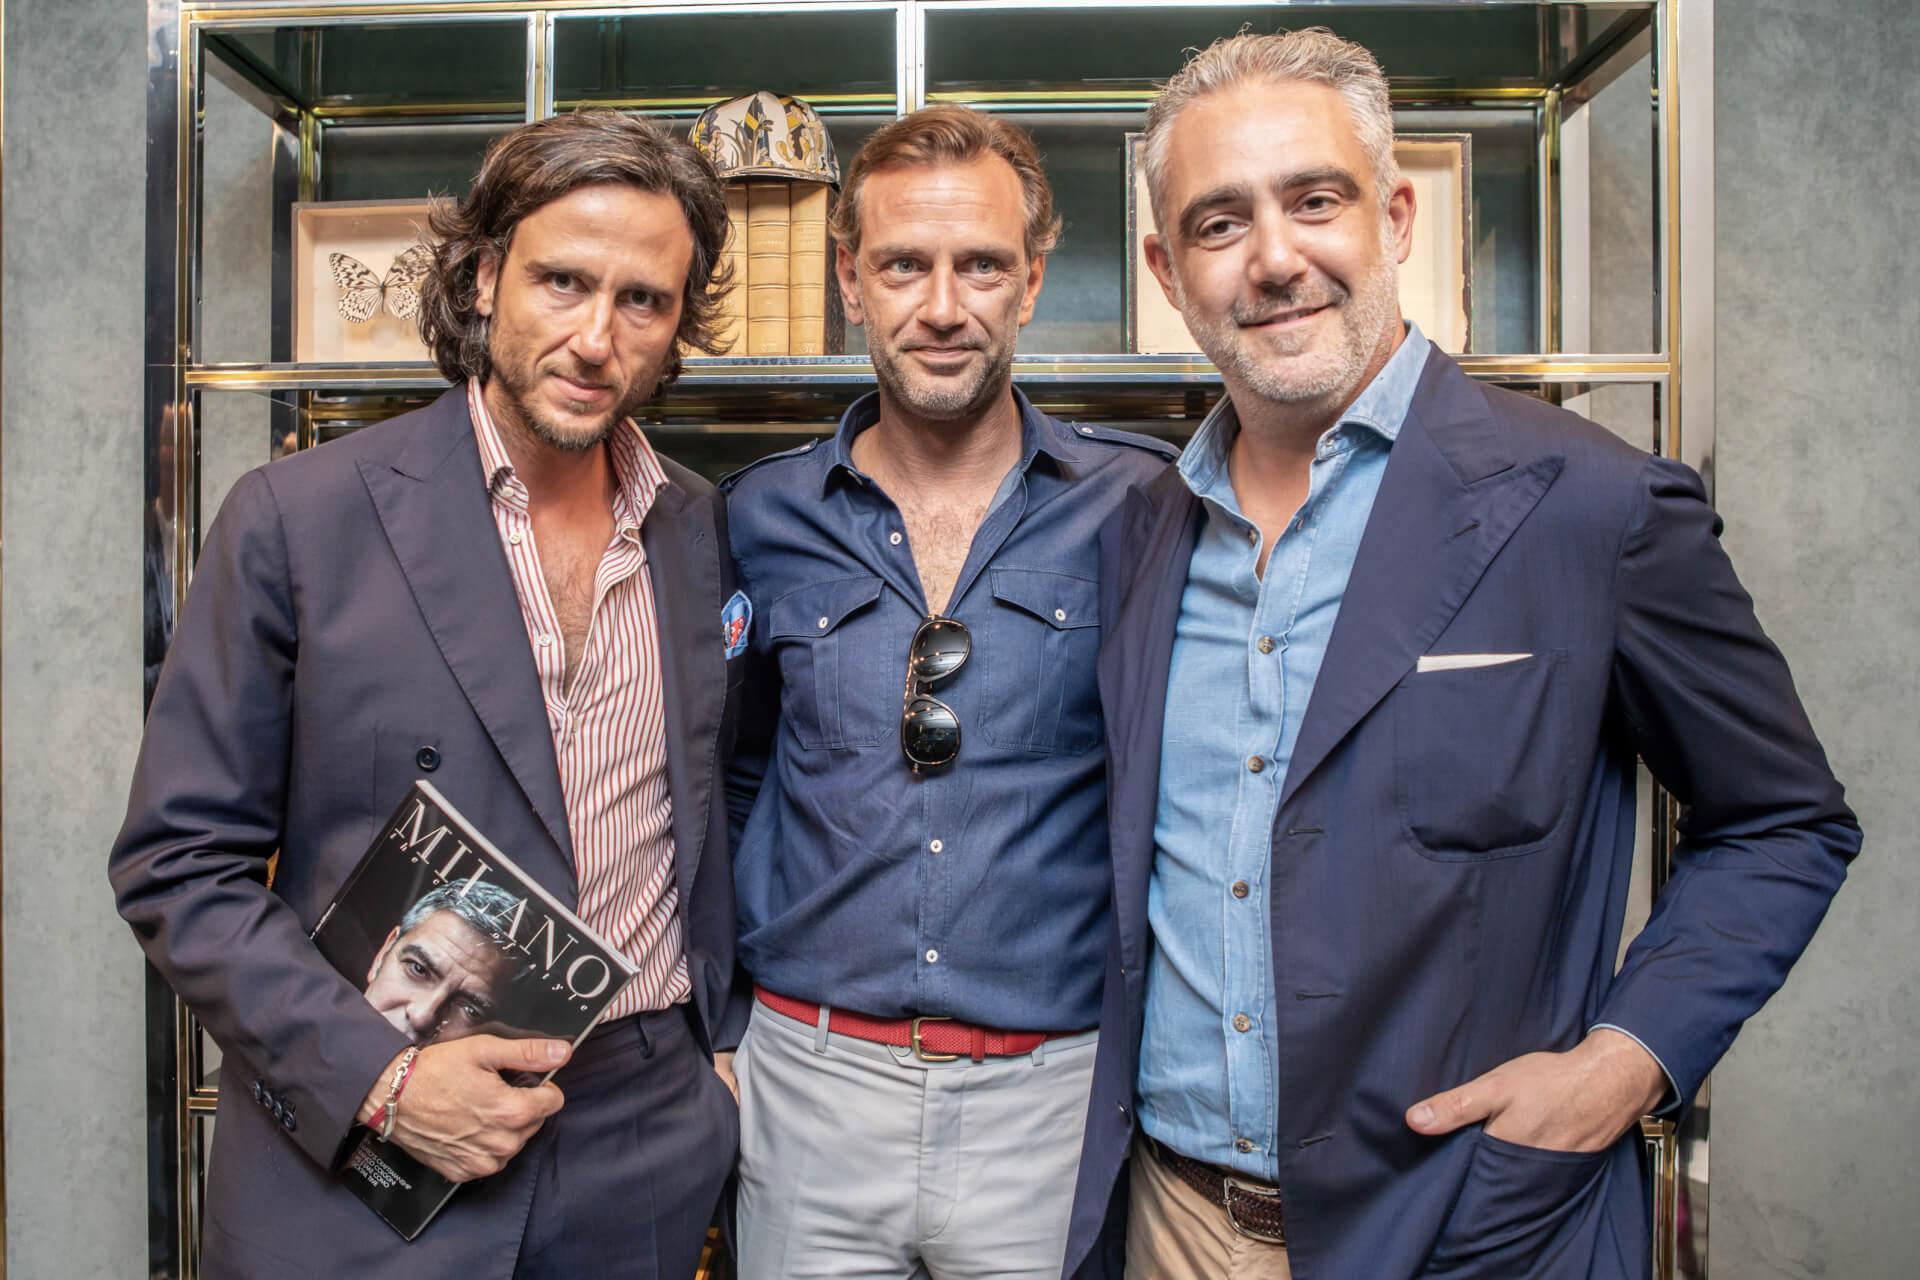 Alex Vittorio Lana, Guglielmo Miani, Matteo Parigi Bini